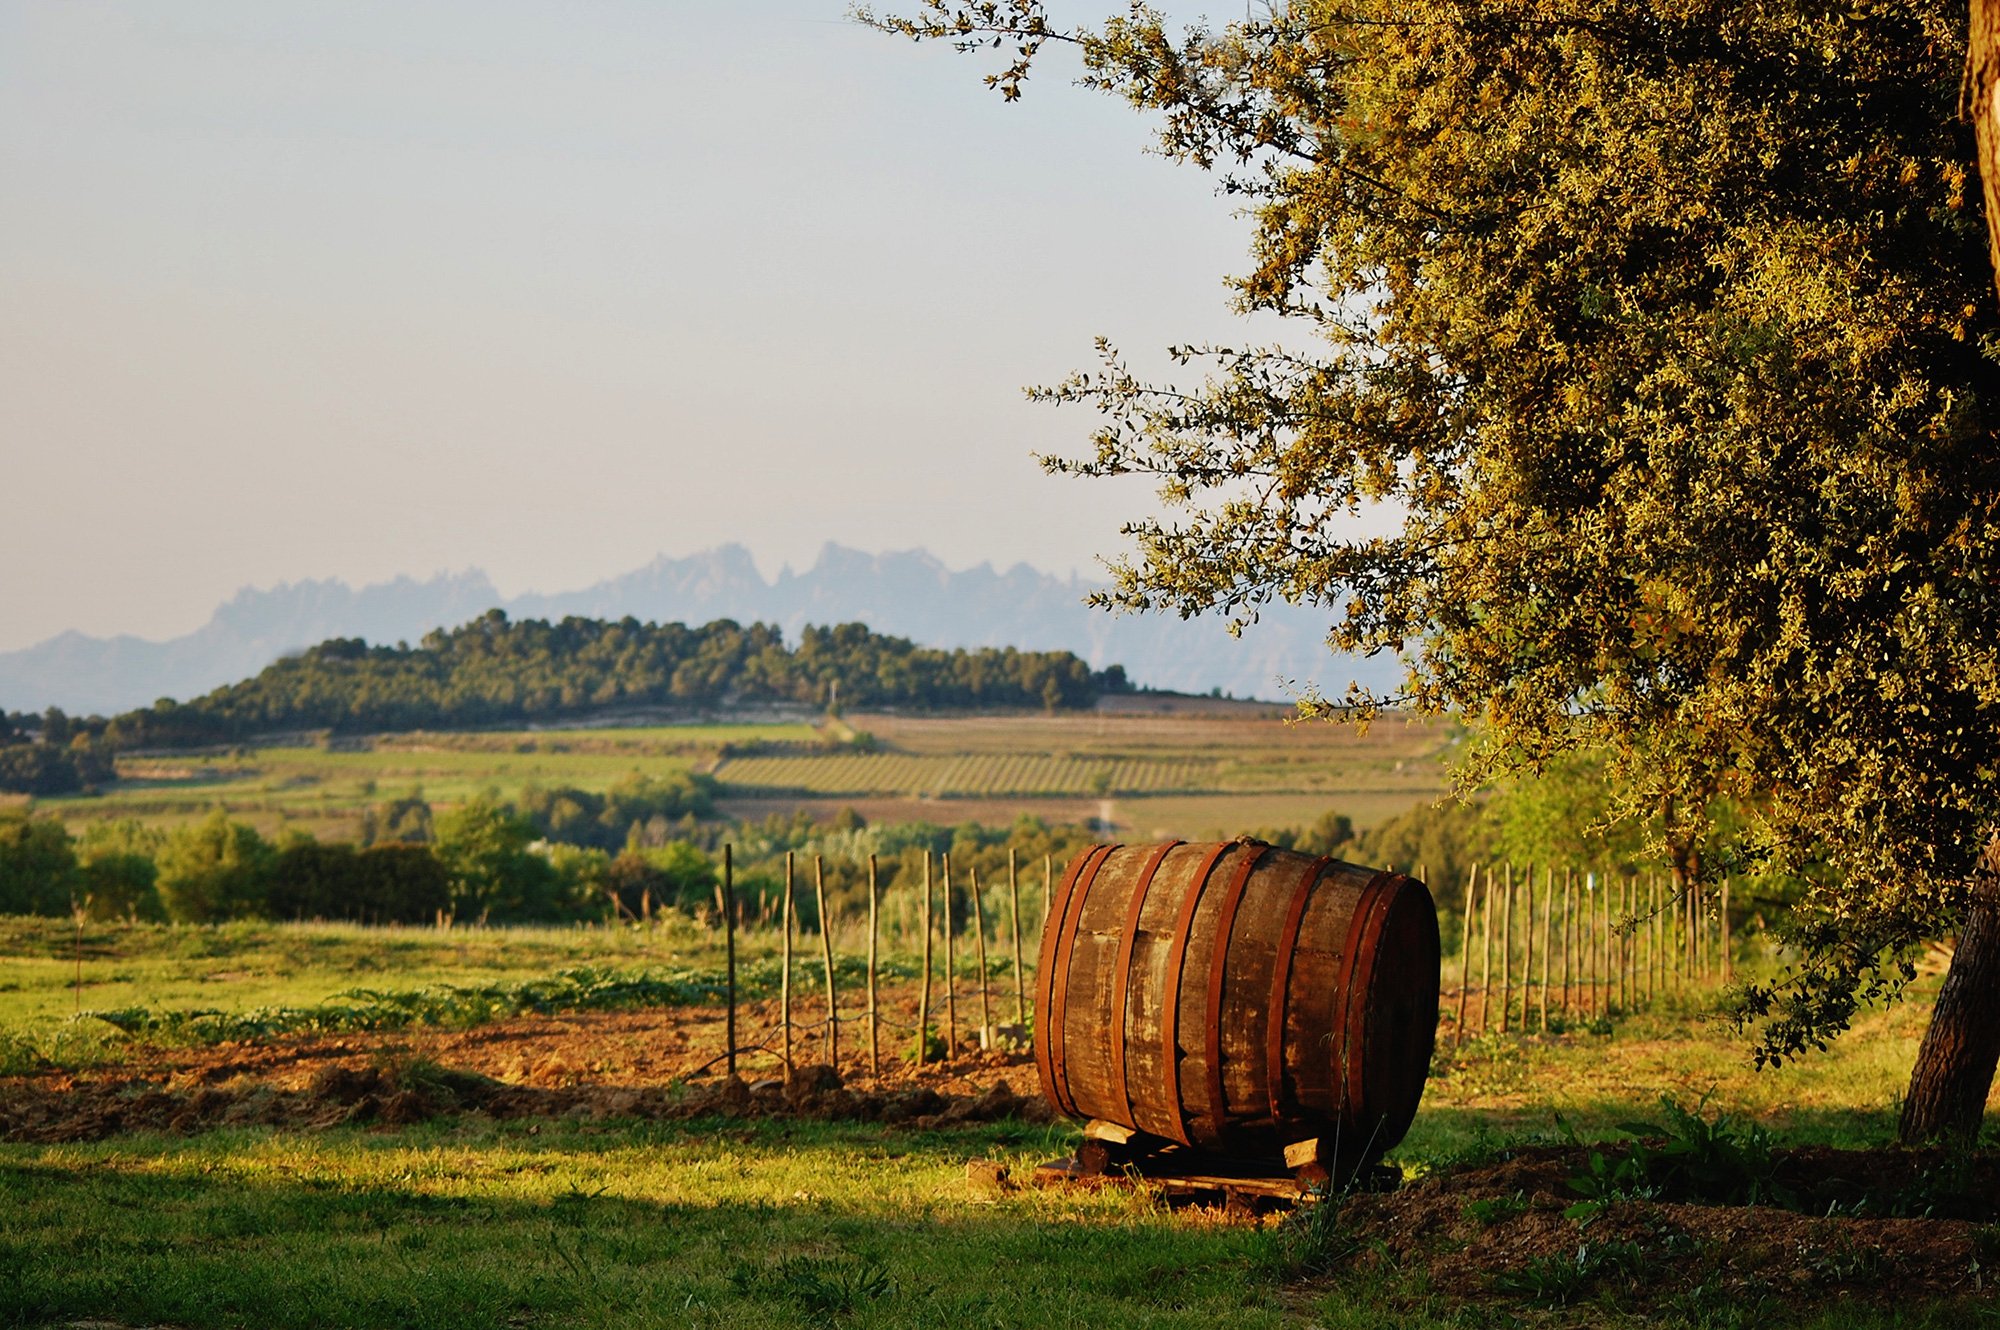 Winery-Maria-Rosa-Ferre-WEB RESIZE.jpg